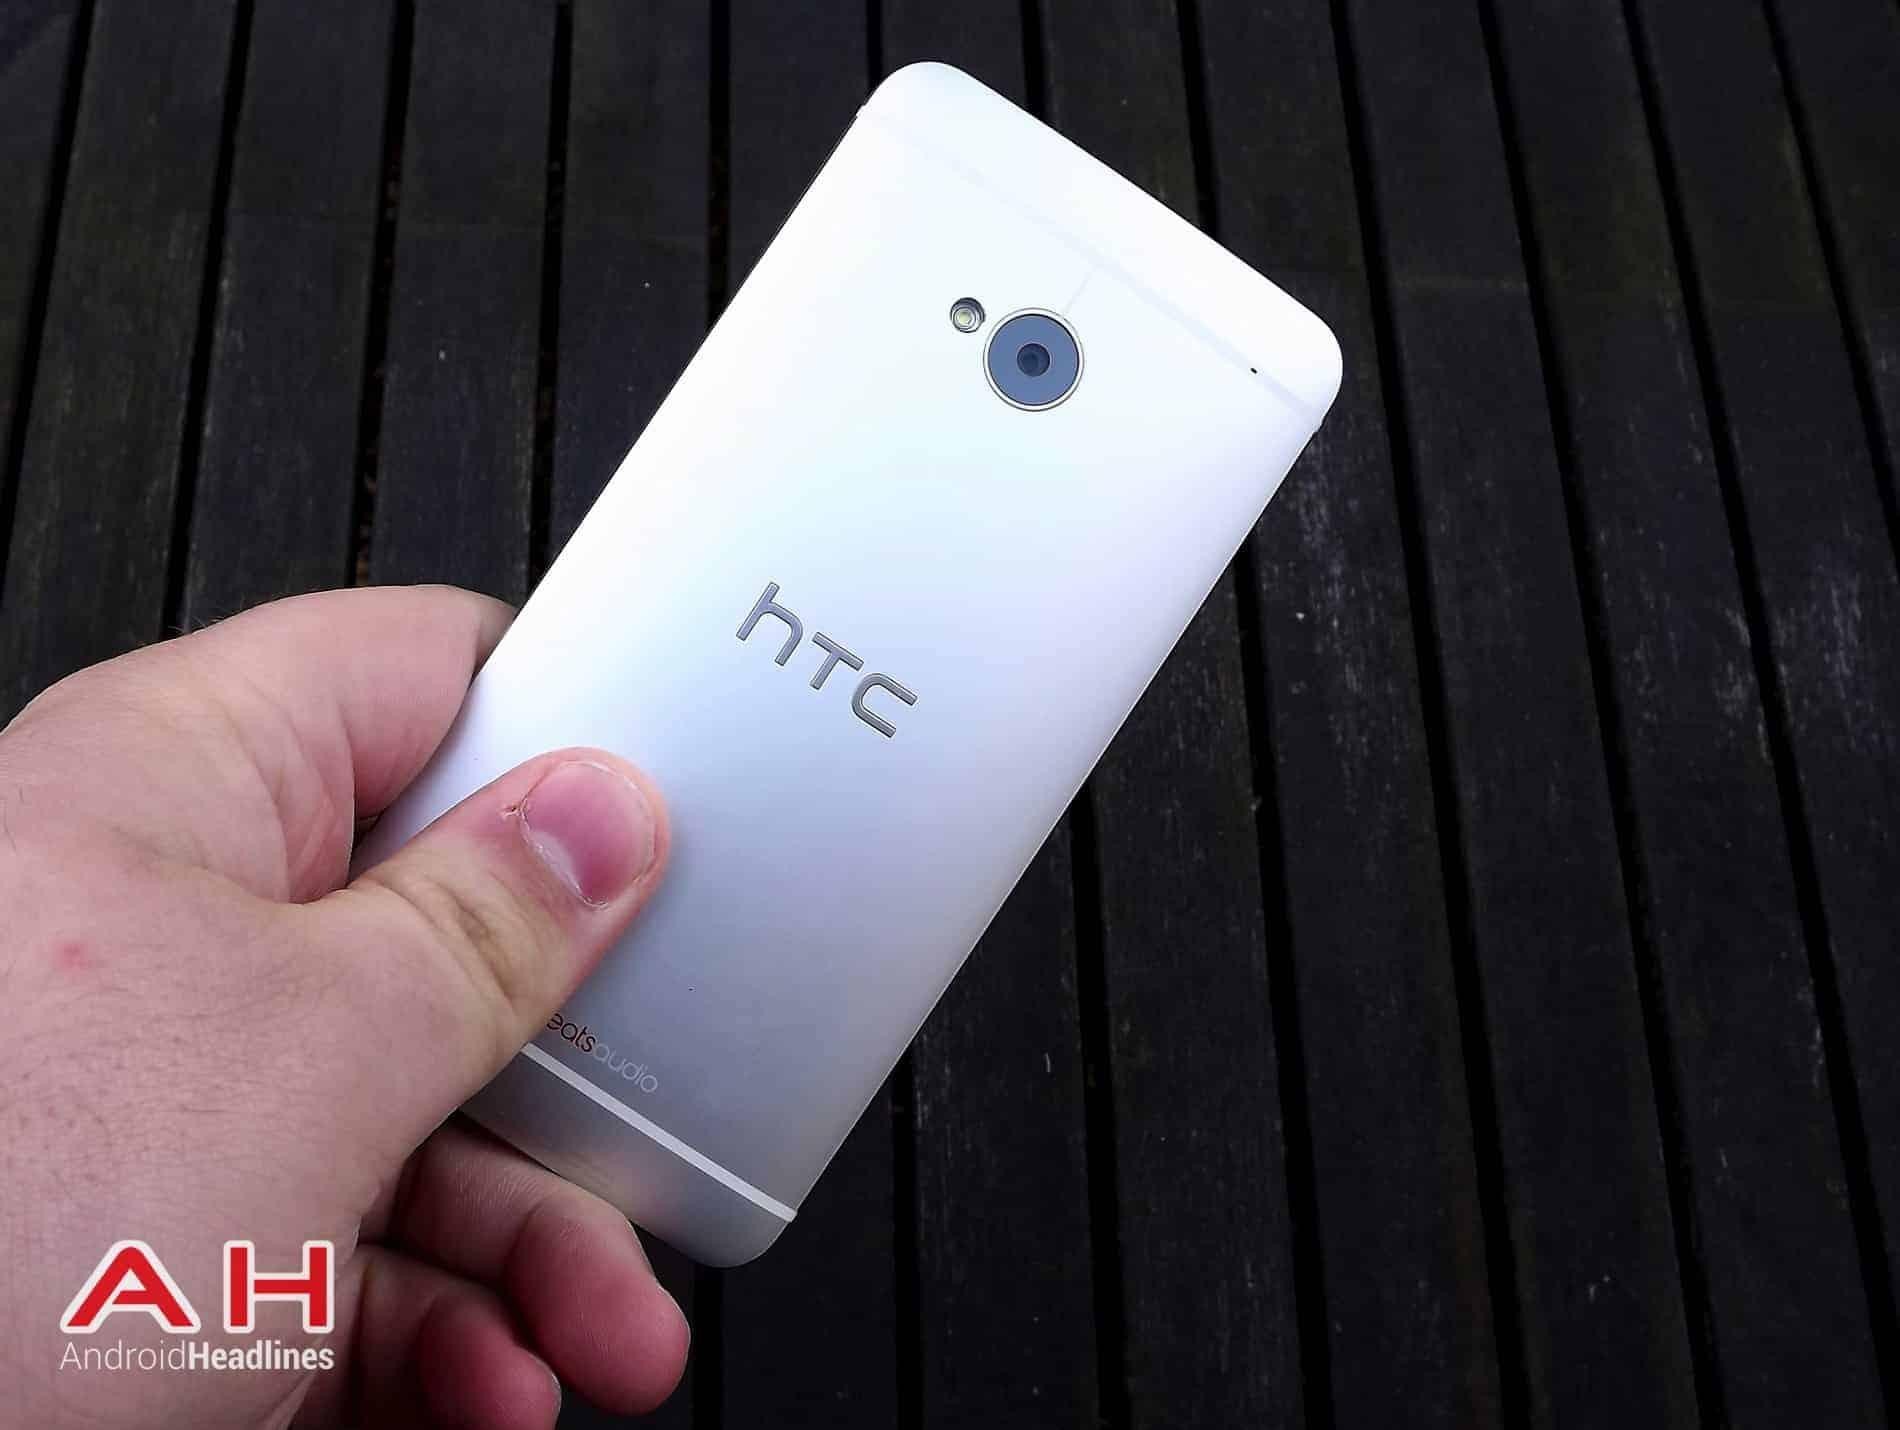 HTC One M7 HD AH 12